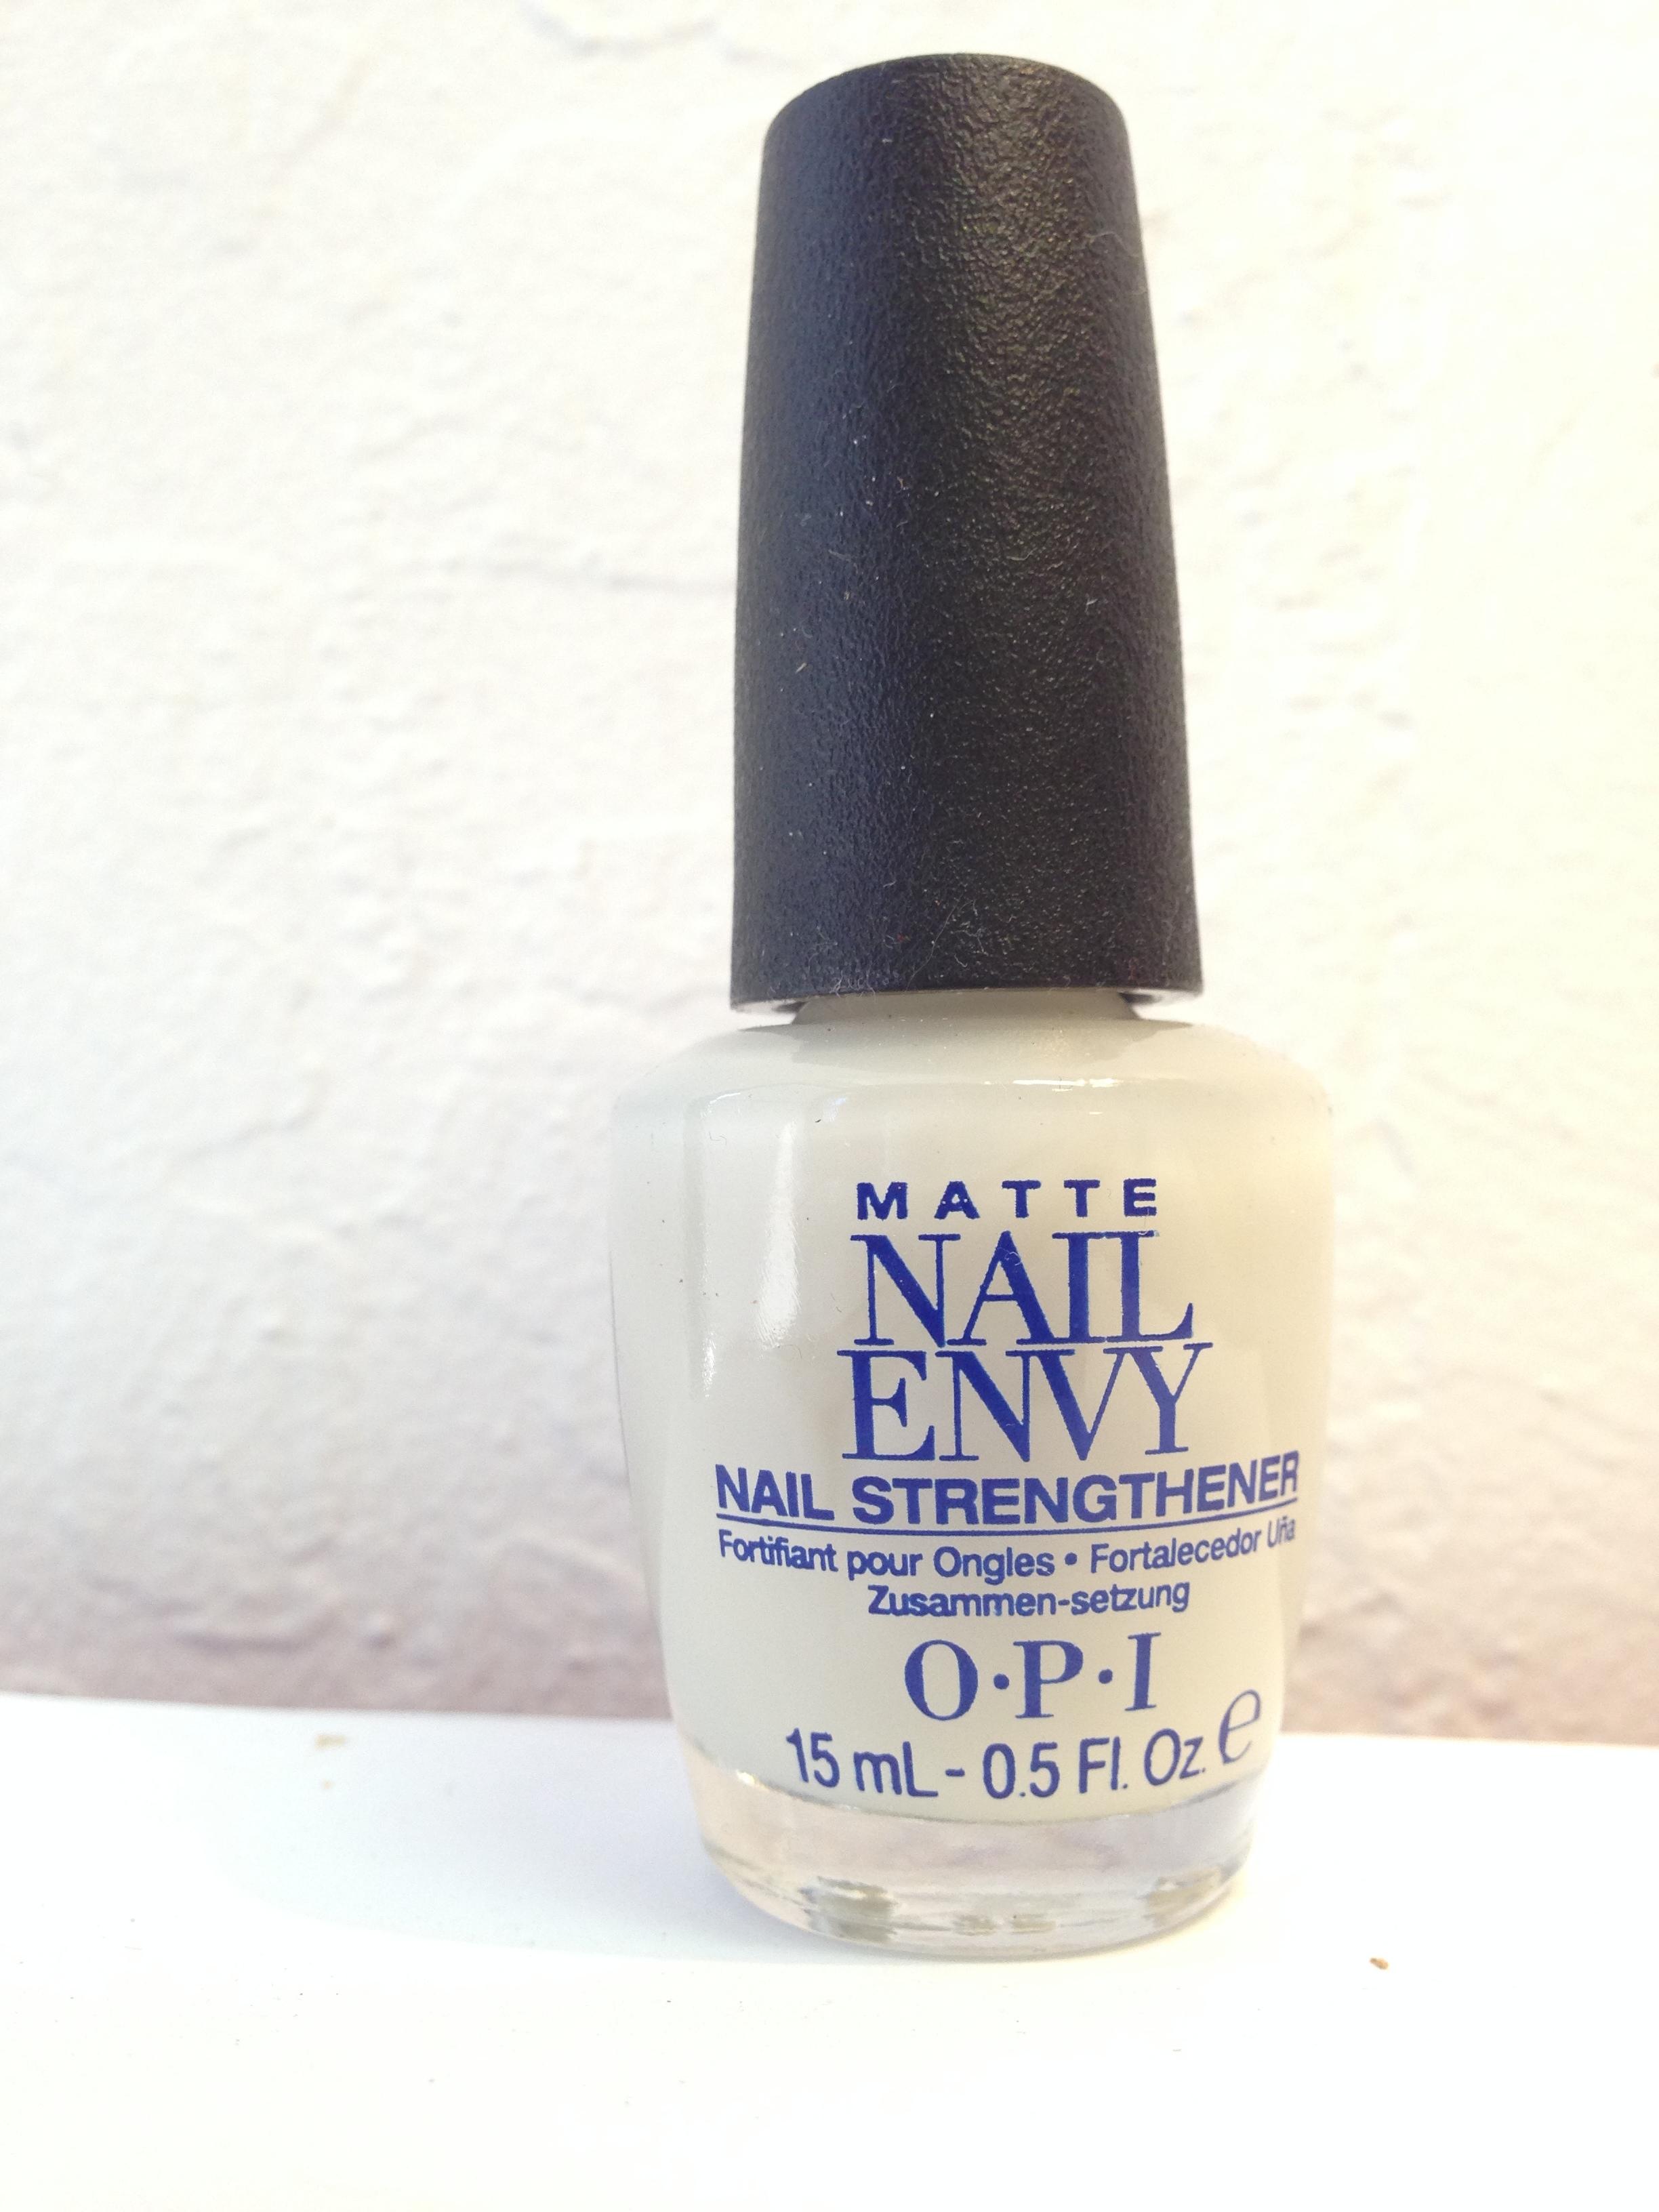 OPI - Matte Nail Envy Nail Strengthener · My Little Pretties ...